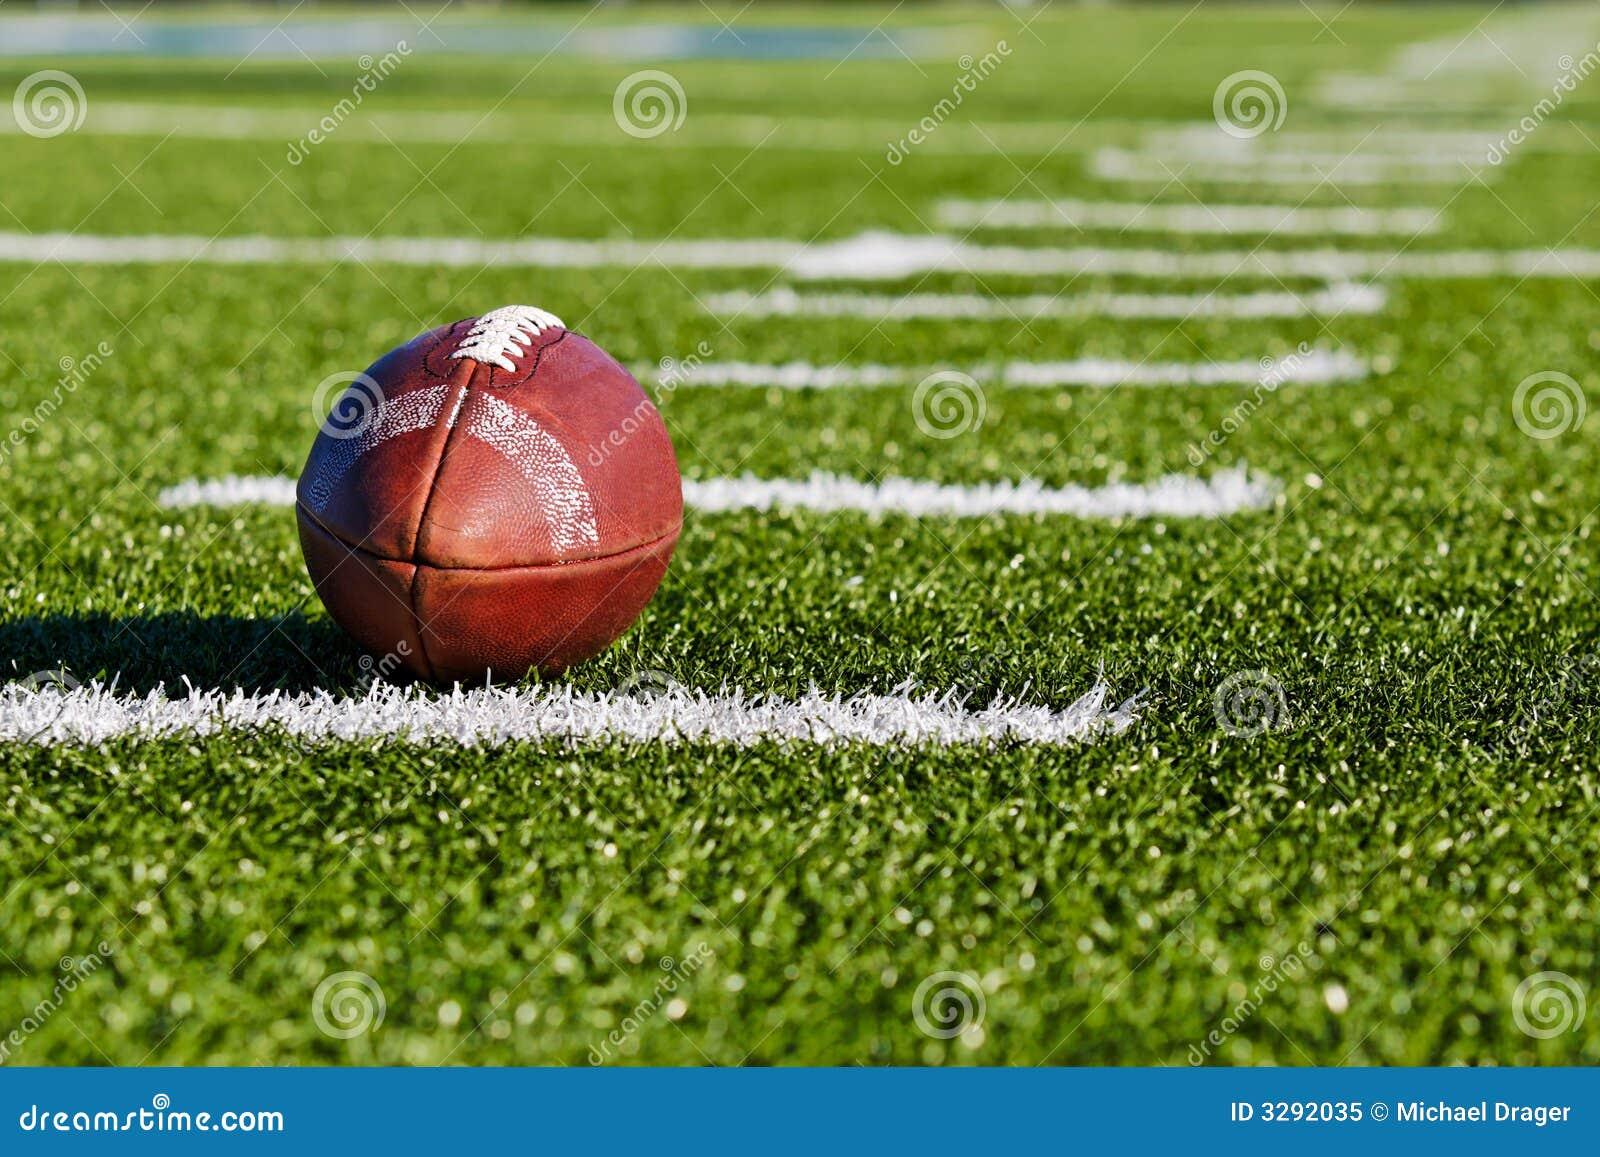 Futbol pola